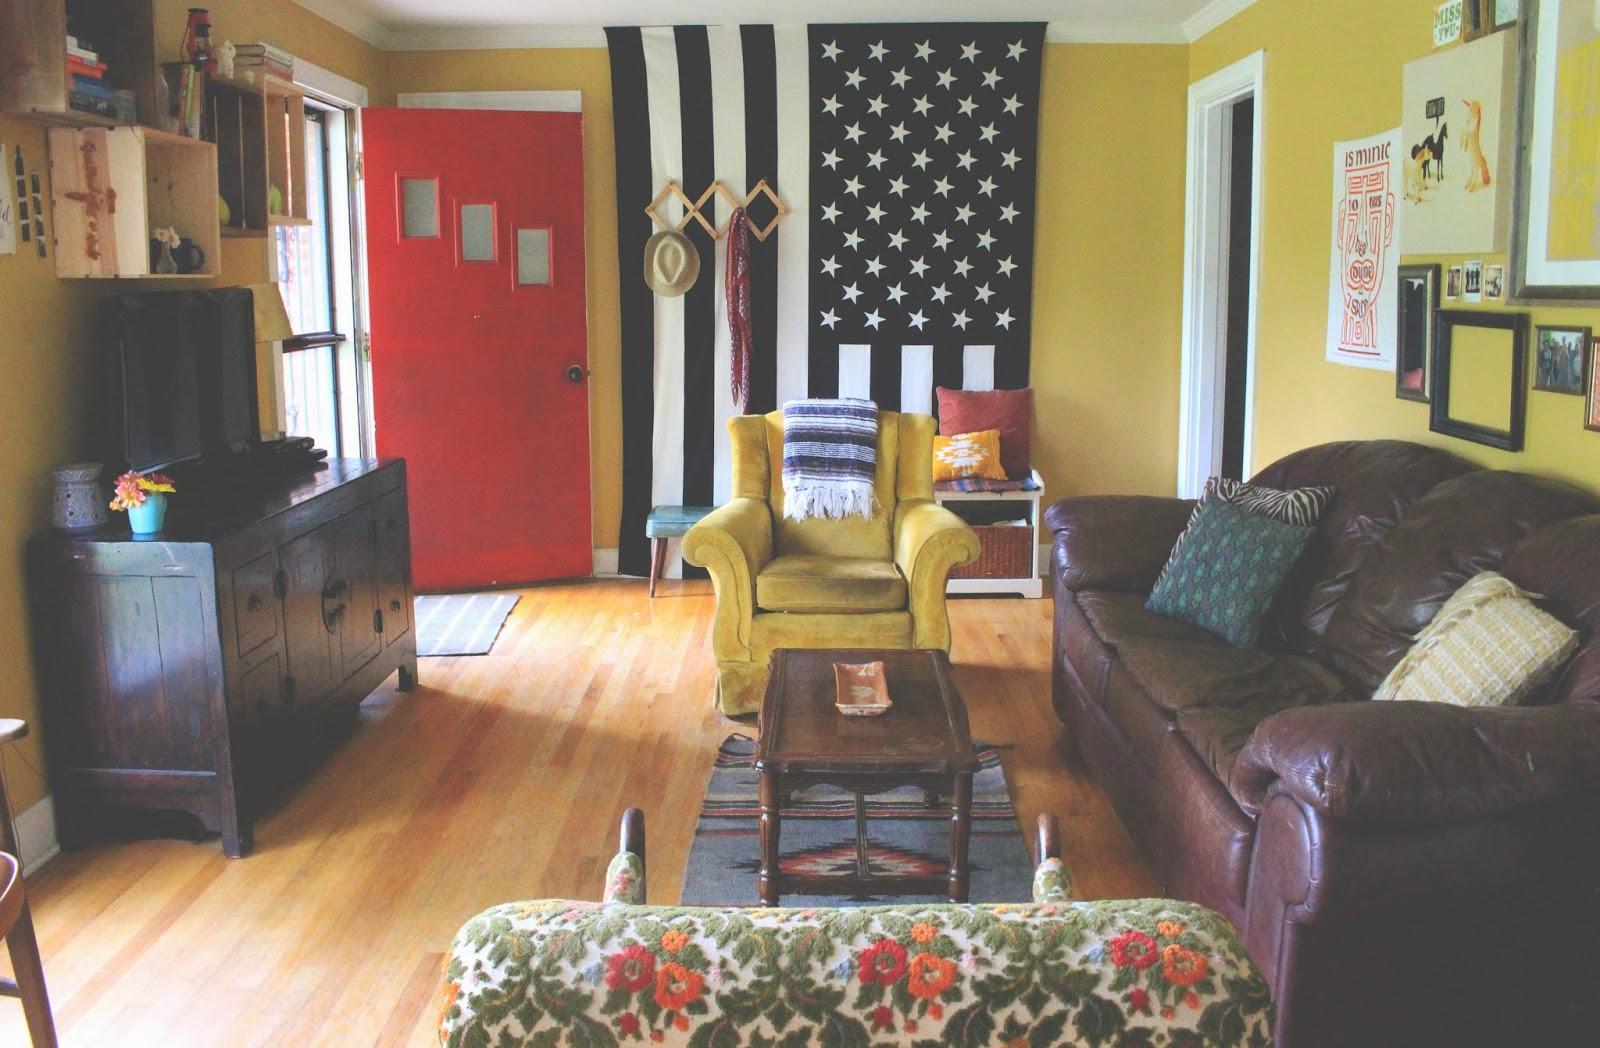 Living Room Things